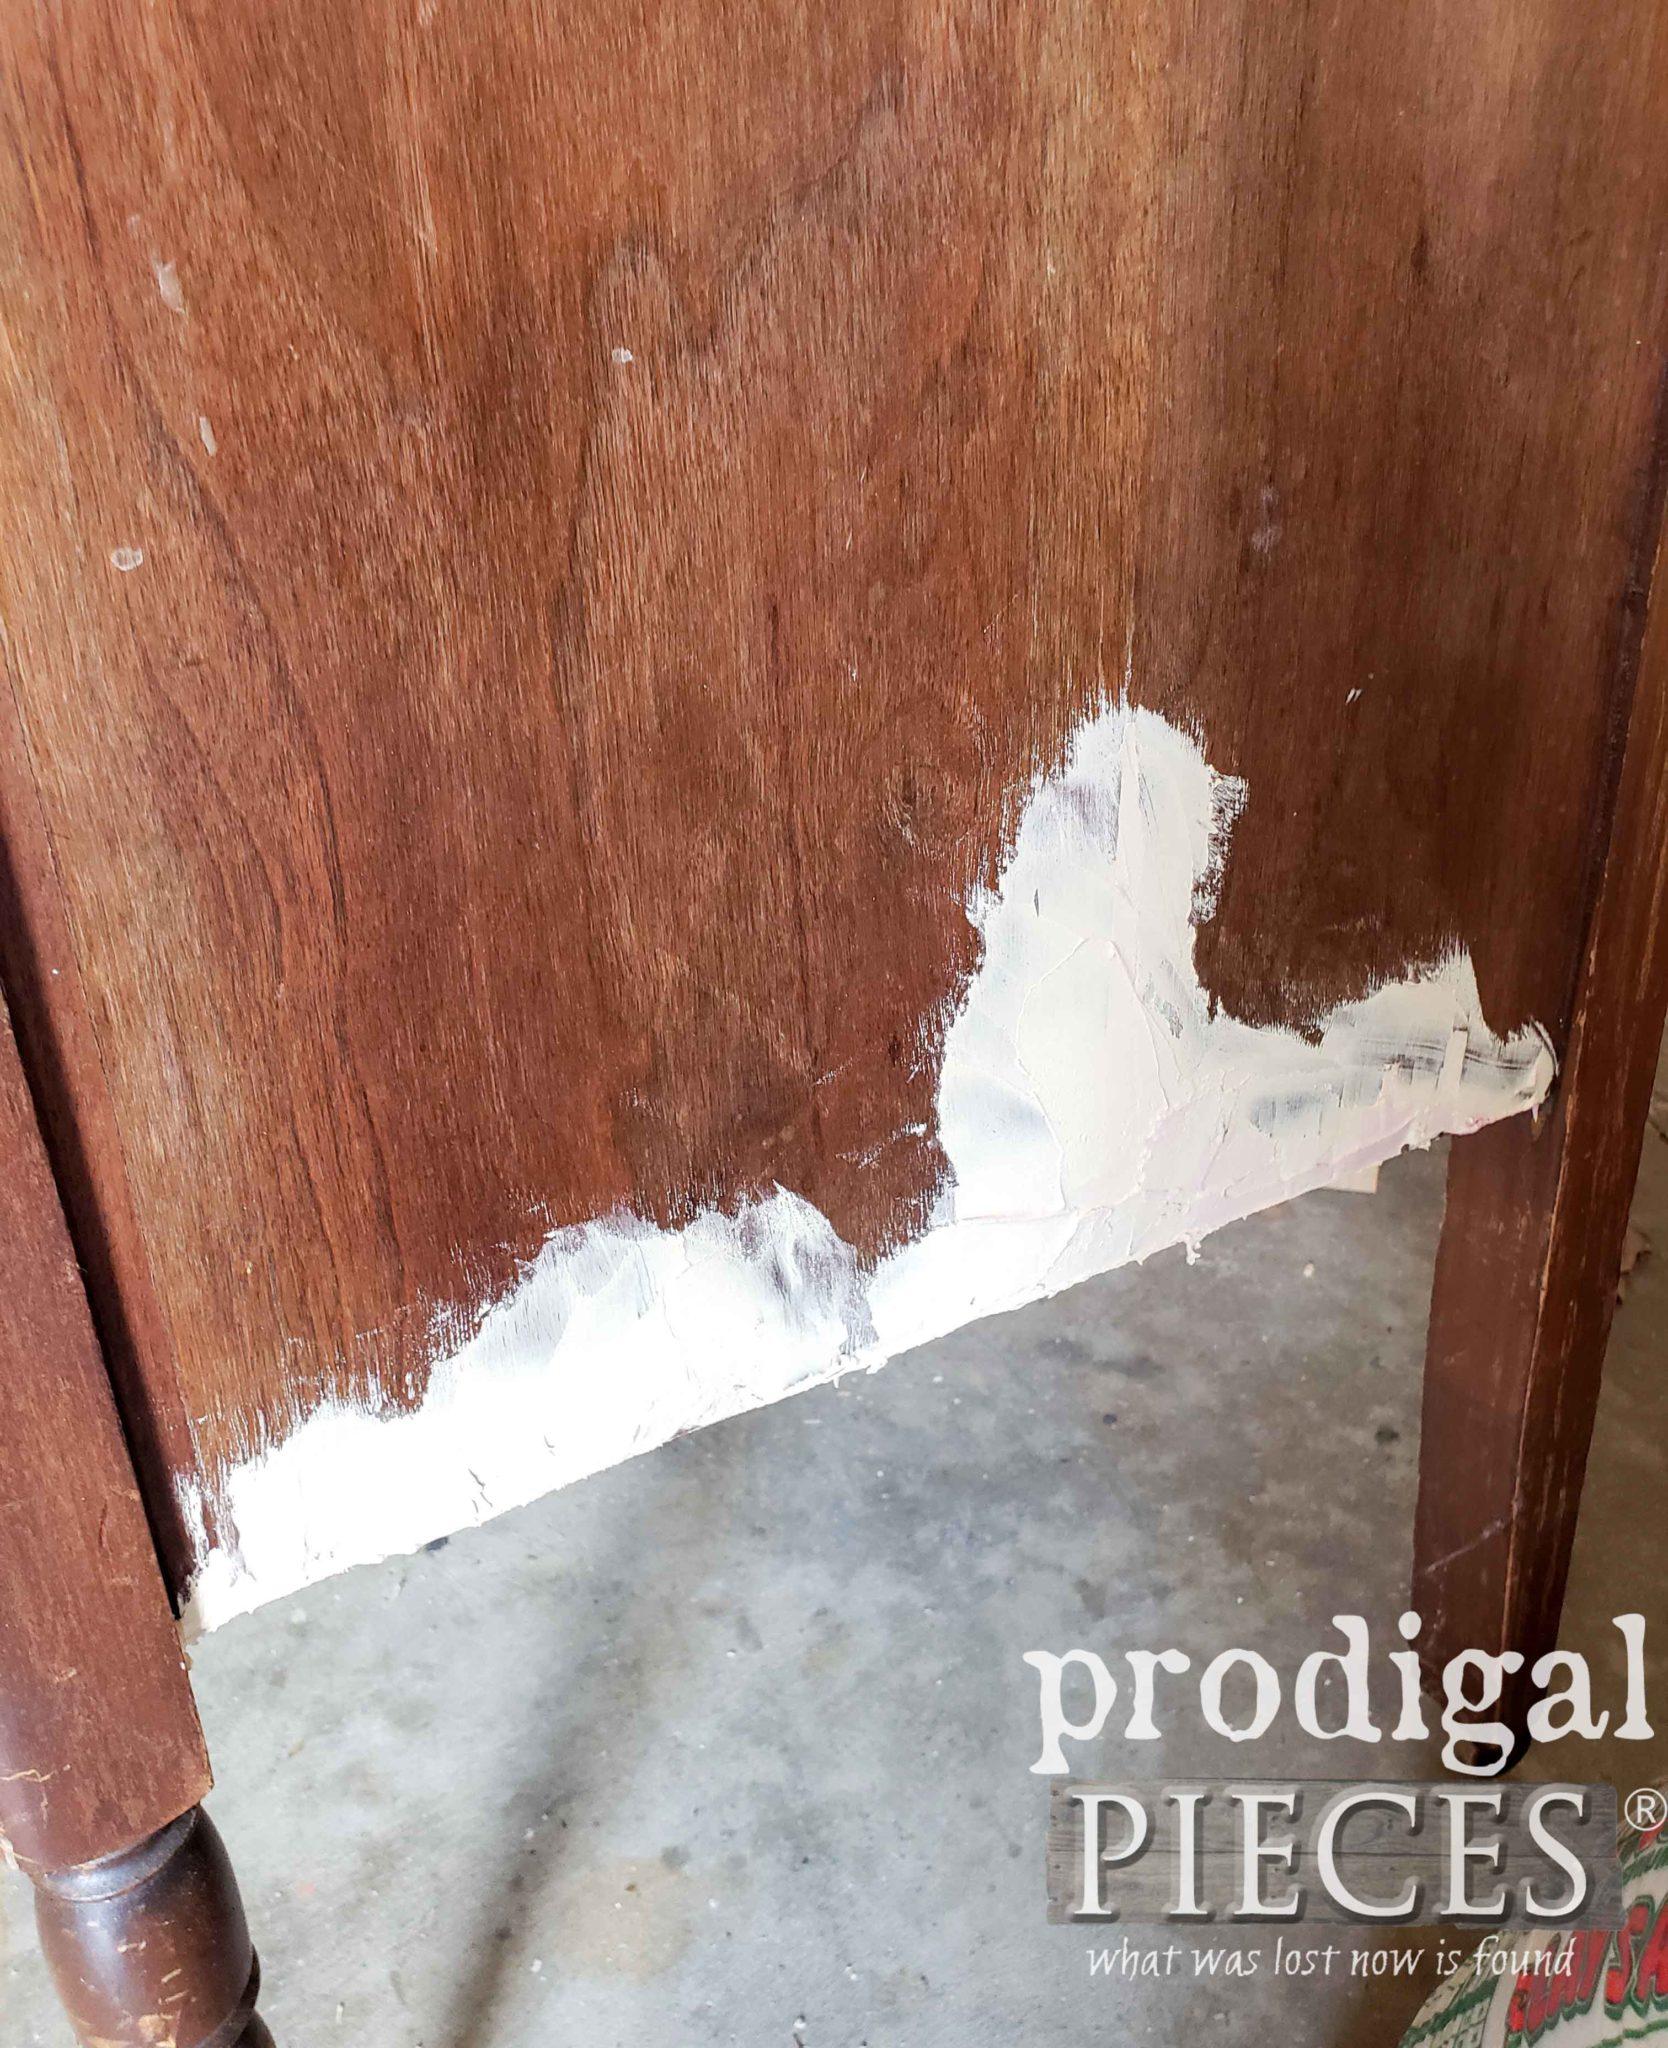 Repair Damaged Veneer with Wood Filler | prodigalpieces.com #prodigalpieces